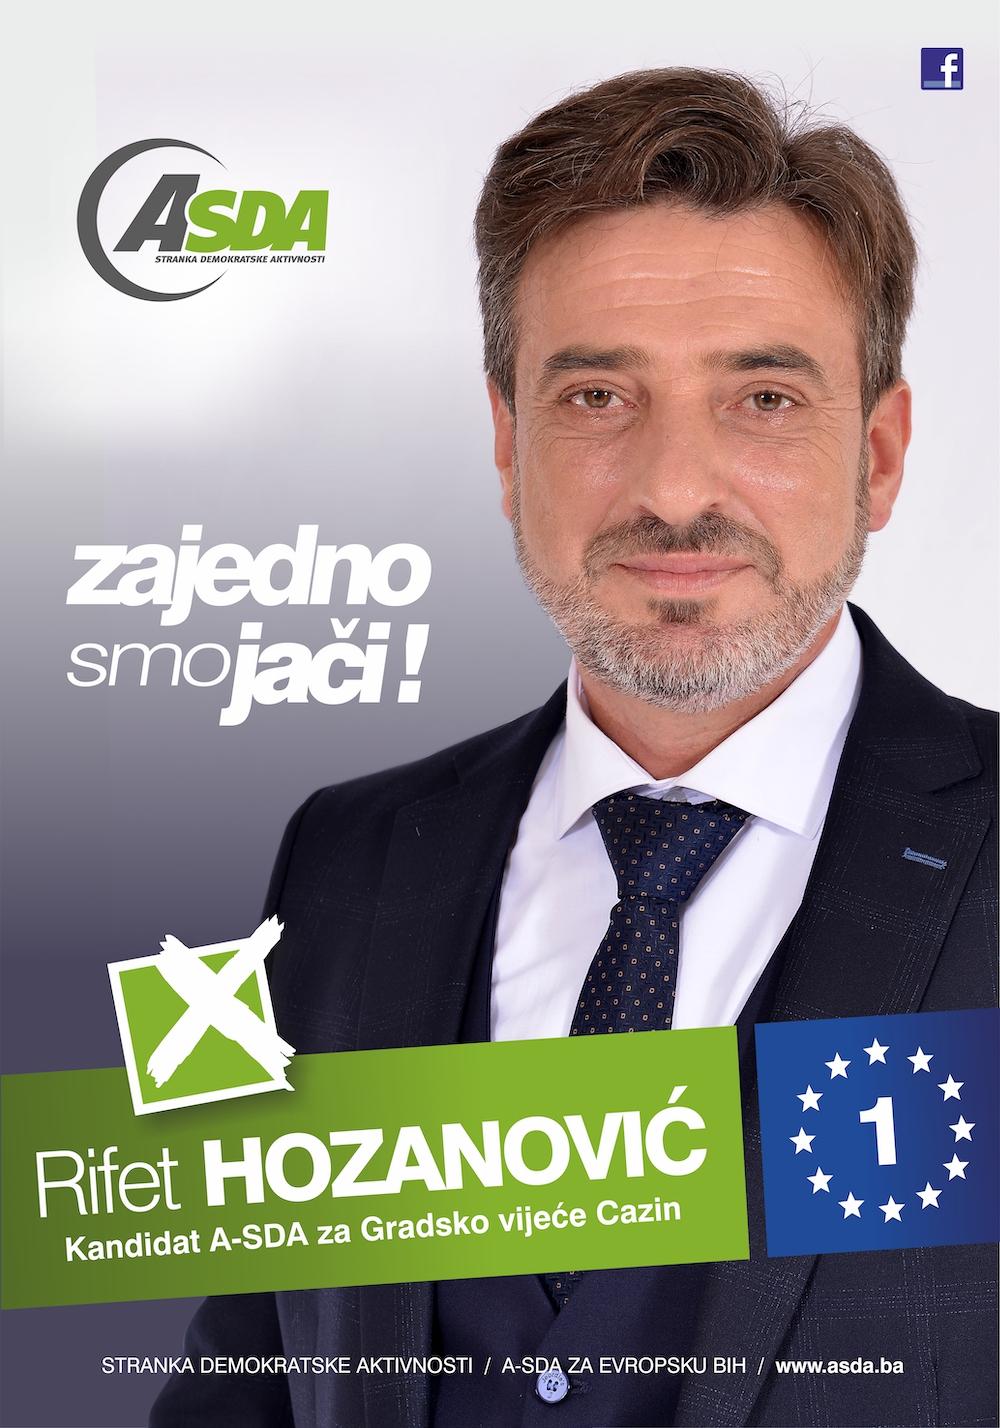 Rifet Hozanović